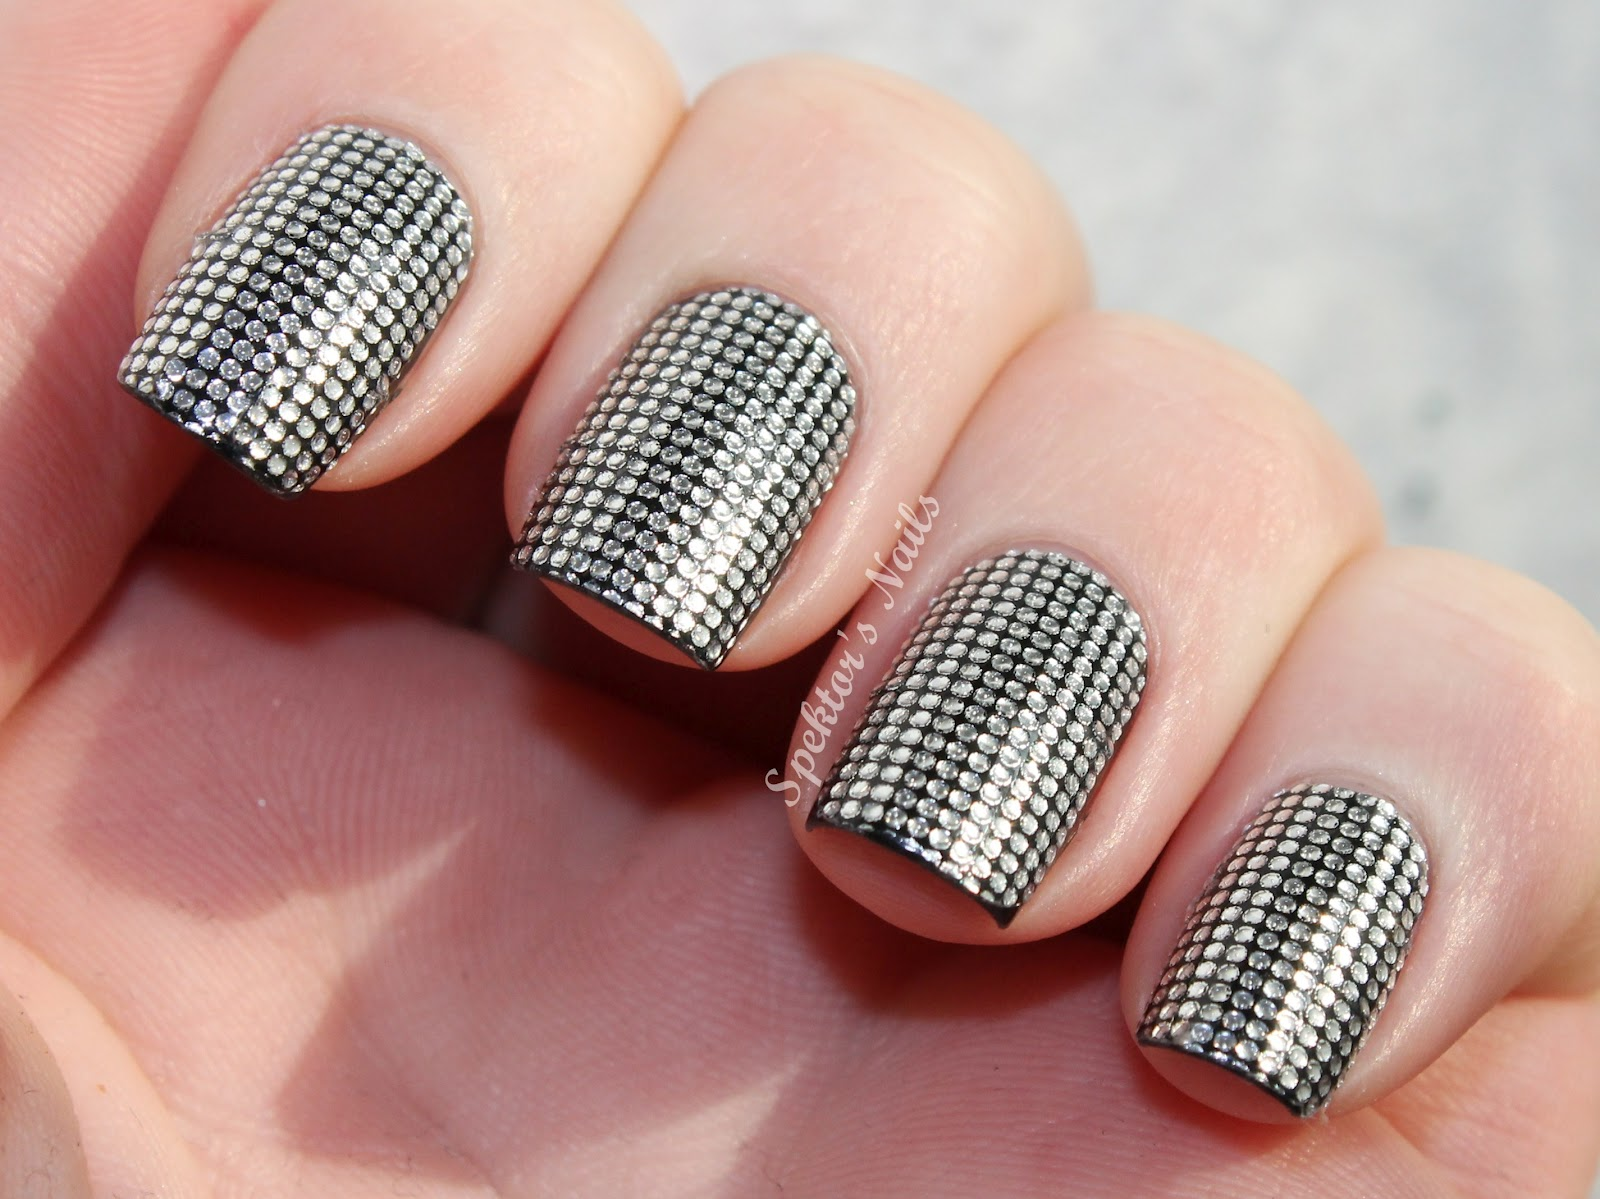 "Foto: Reprodução / <a href=""http://www.spektorsnails.com/2012/02/notd-essence-nail-fashion-stickers.html?m=1"" target=""_blank"">Spektor's Nails</a>"